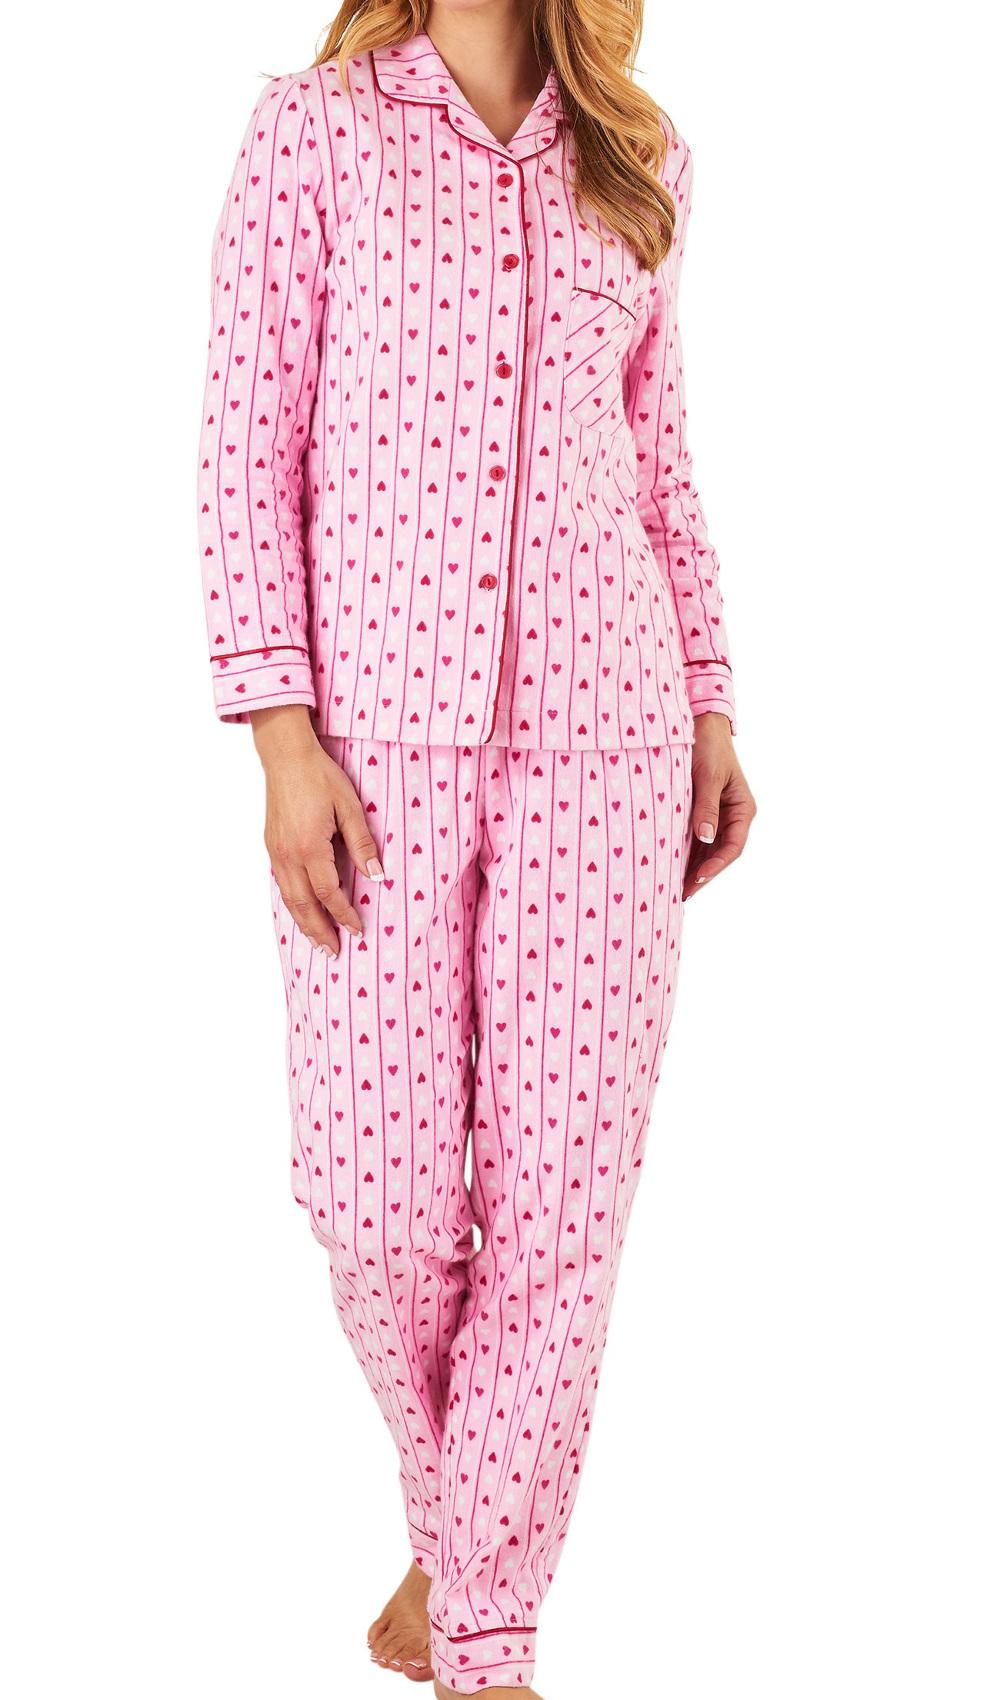 Pyjamas Ladies Slenderella 100% Brushed Cotton PJs Heart Print Womens  Nightwear 3c5072d4b4